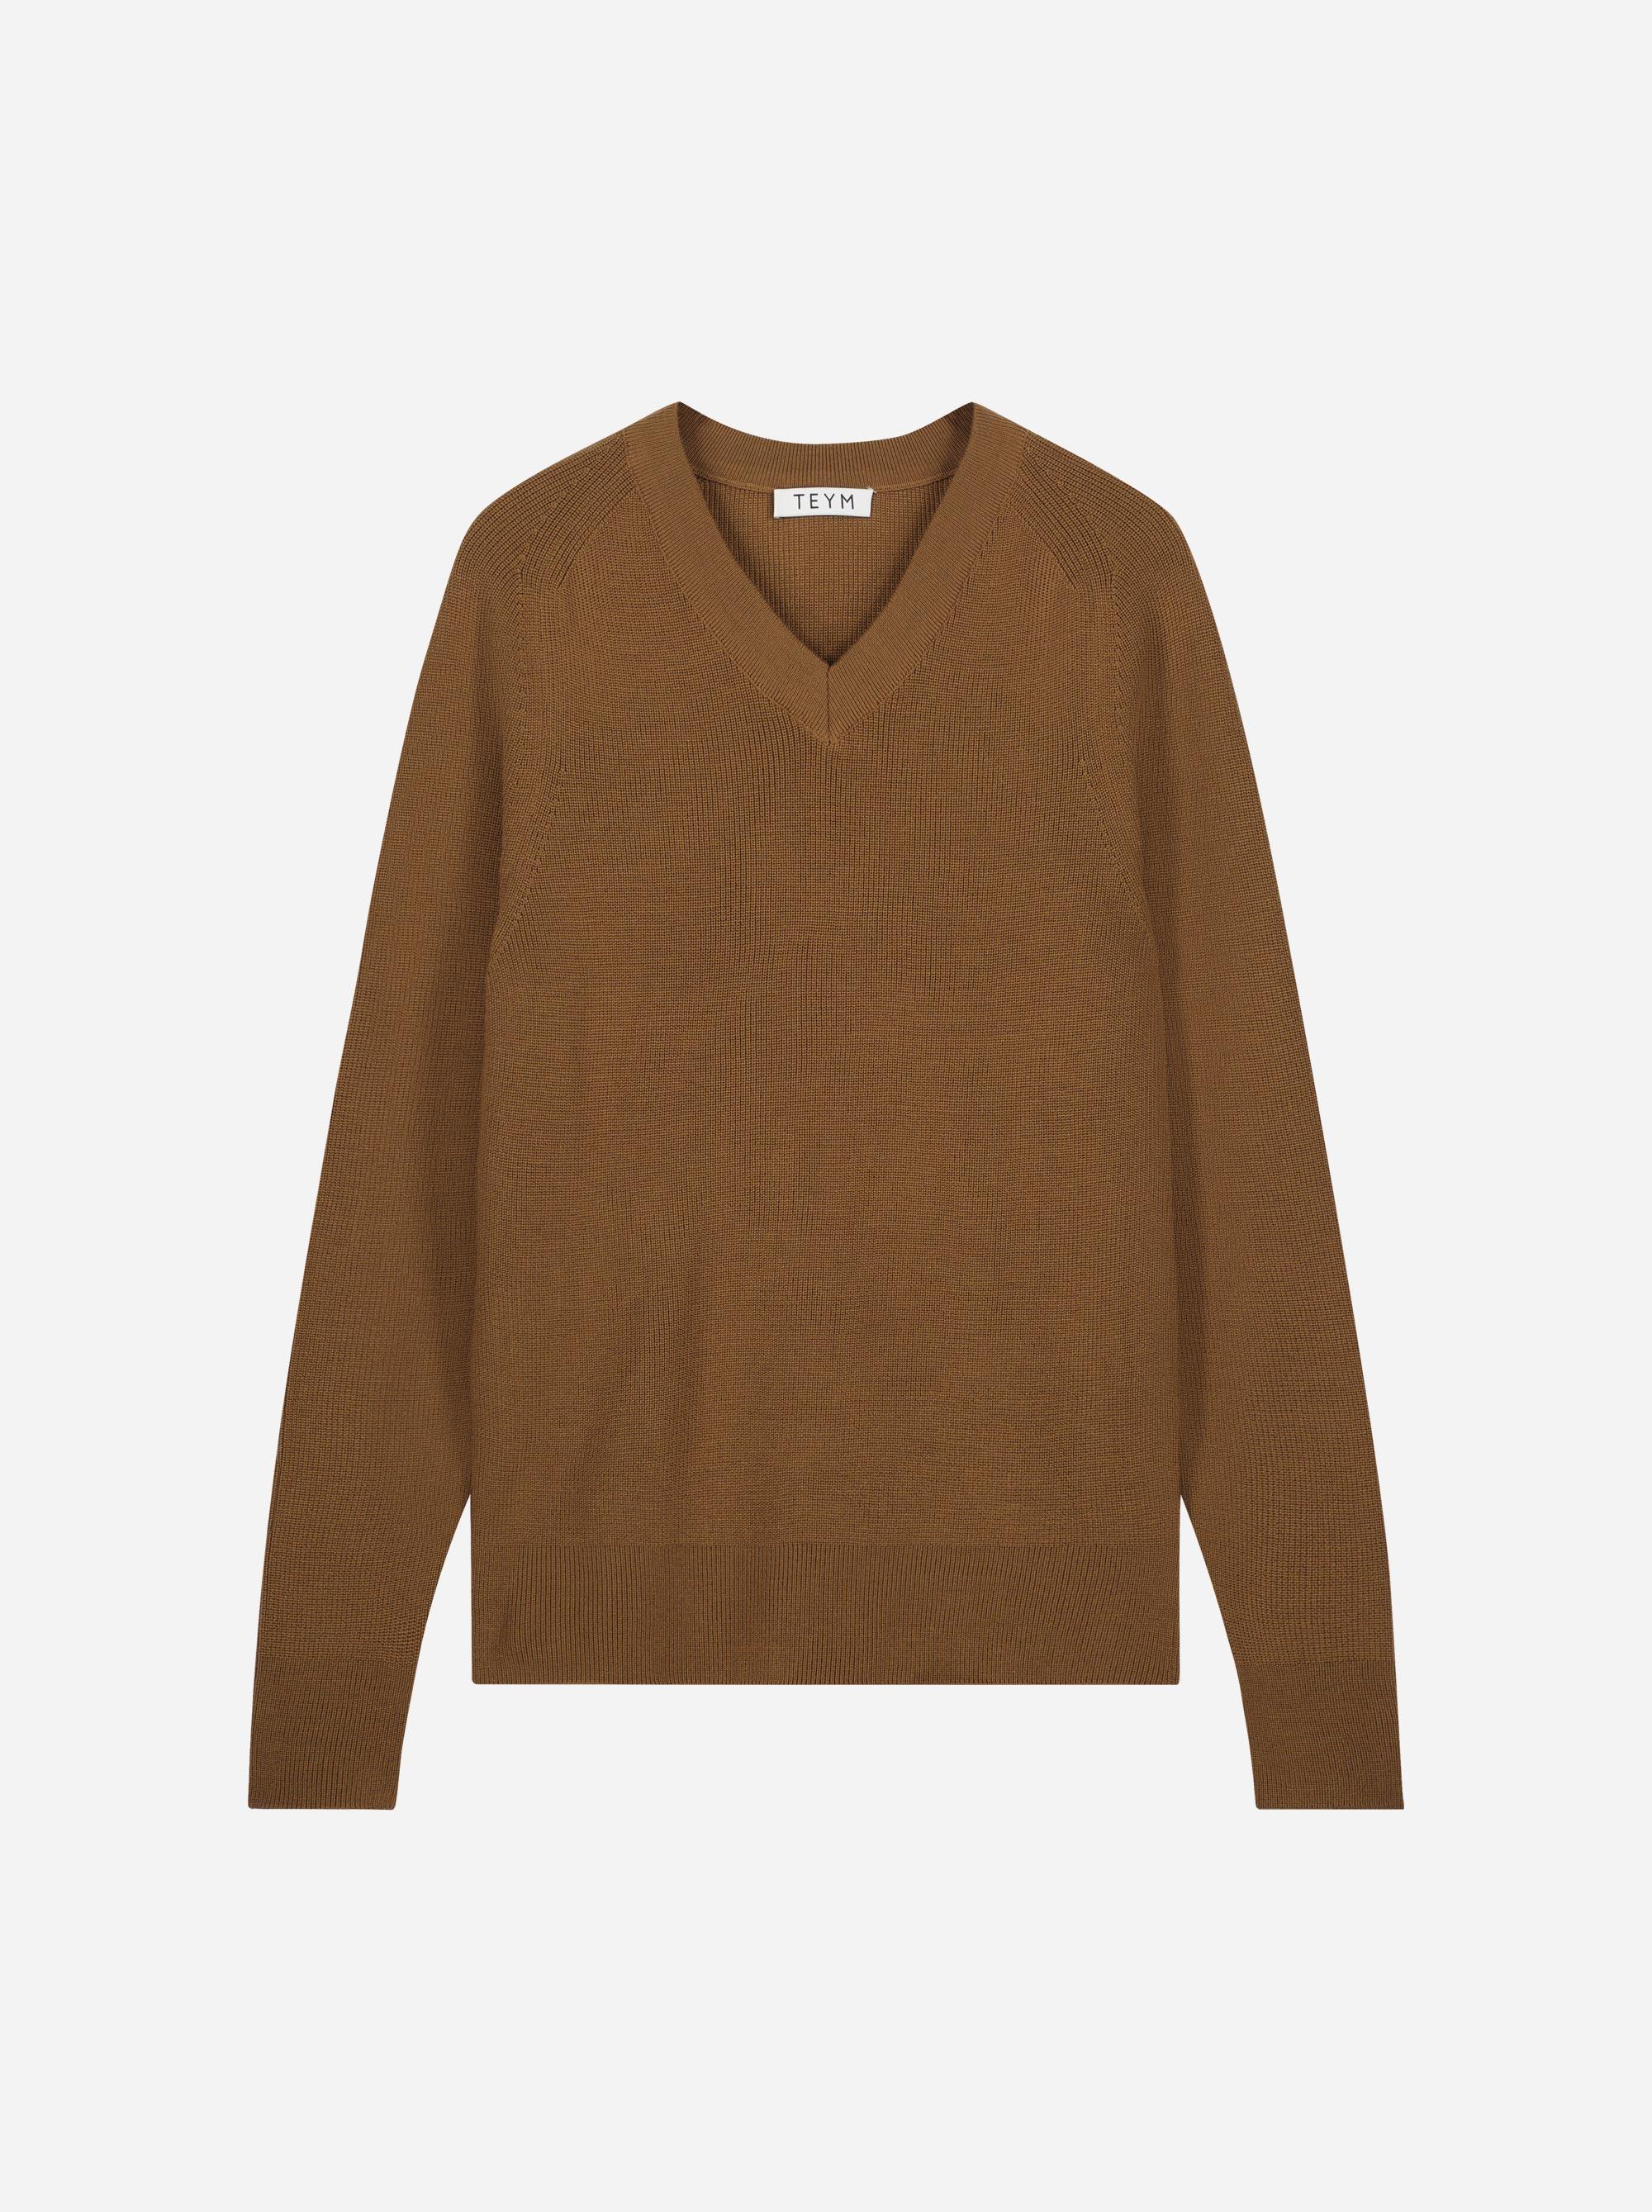 Teym_Merino-Sweater-V-Neck_Brown_front_1